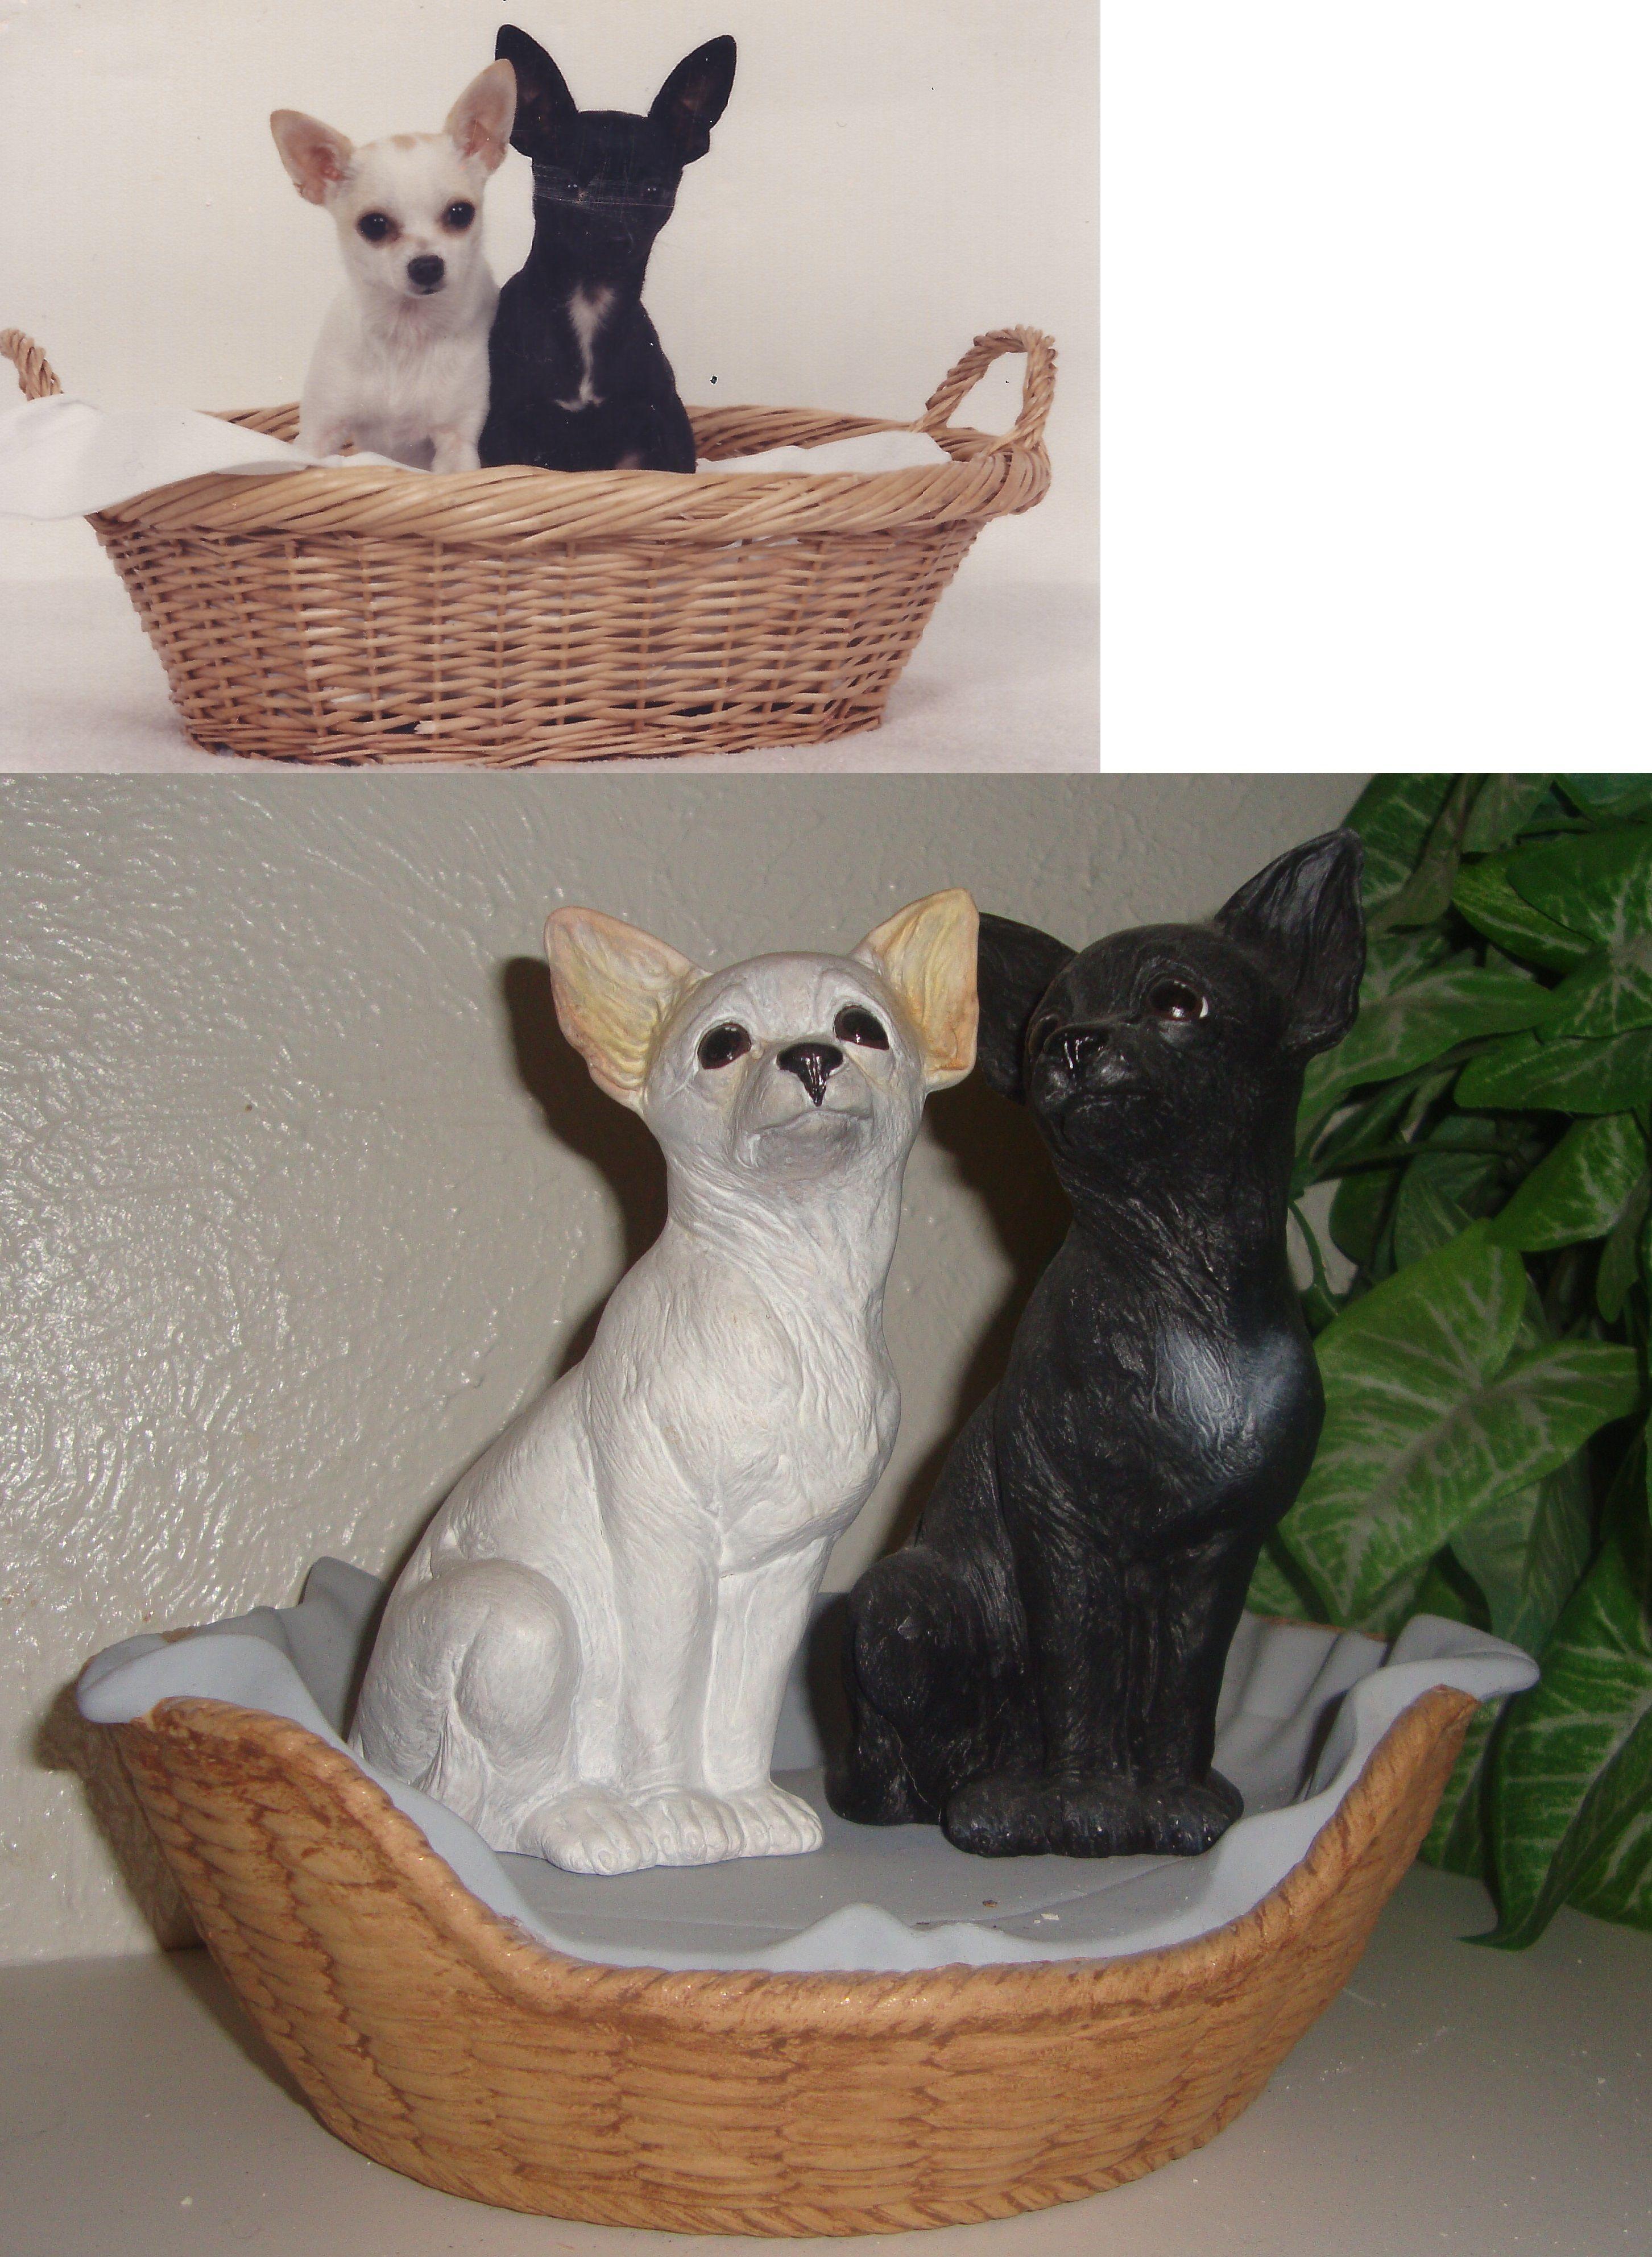 Chihuahua Pic to ceramics (taken) Wicker laundry basket